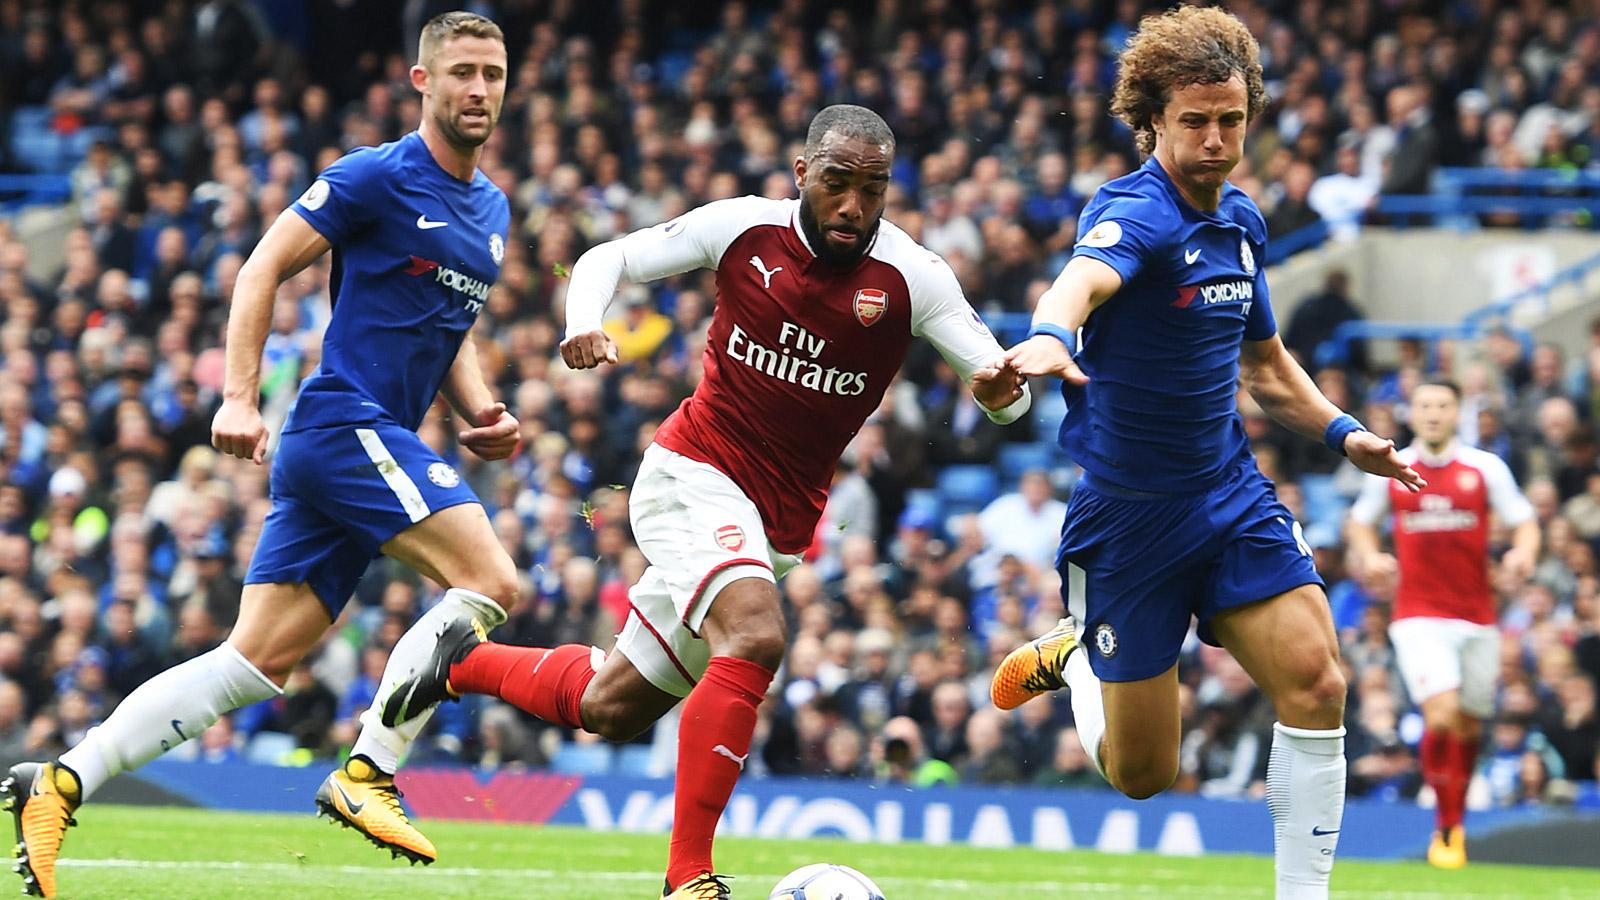 Match video: Chelsea v Arsenal   News   Arsenal.com